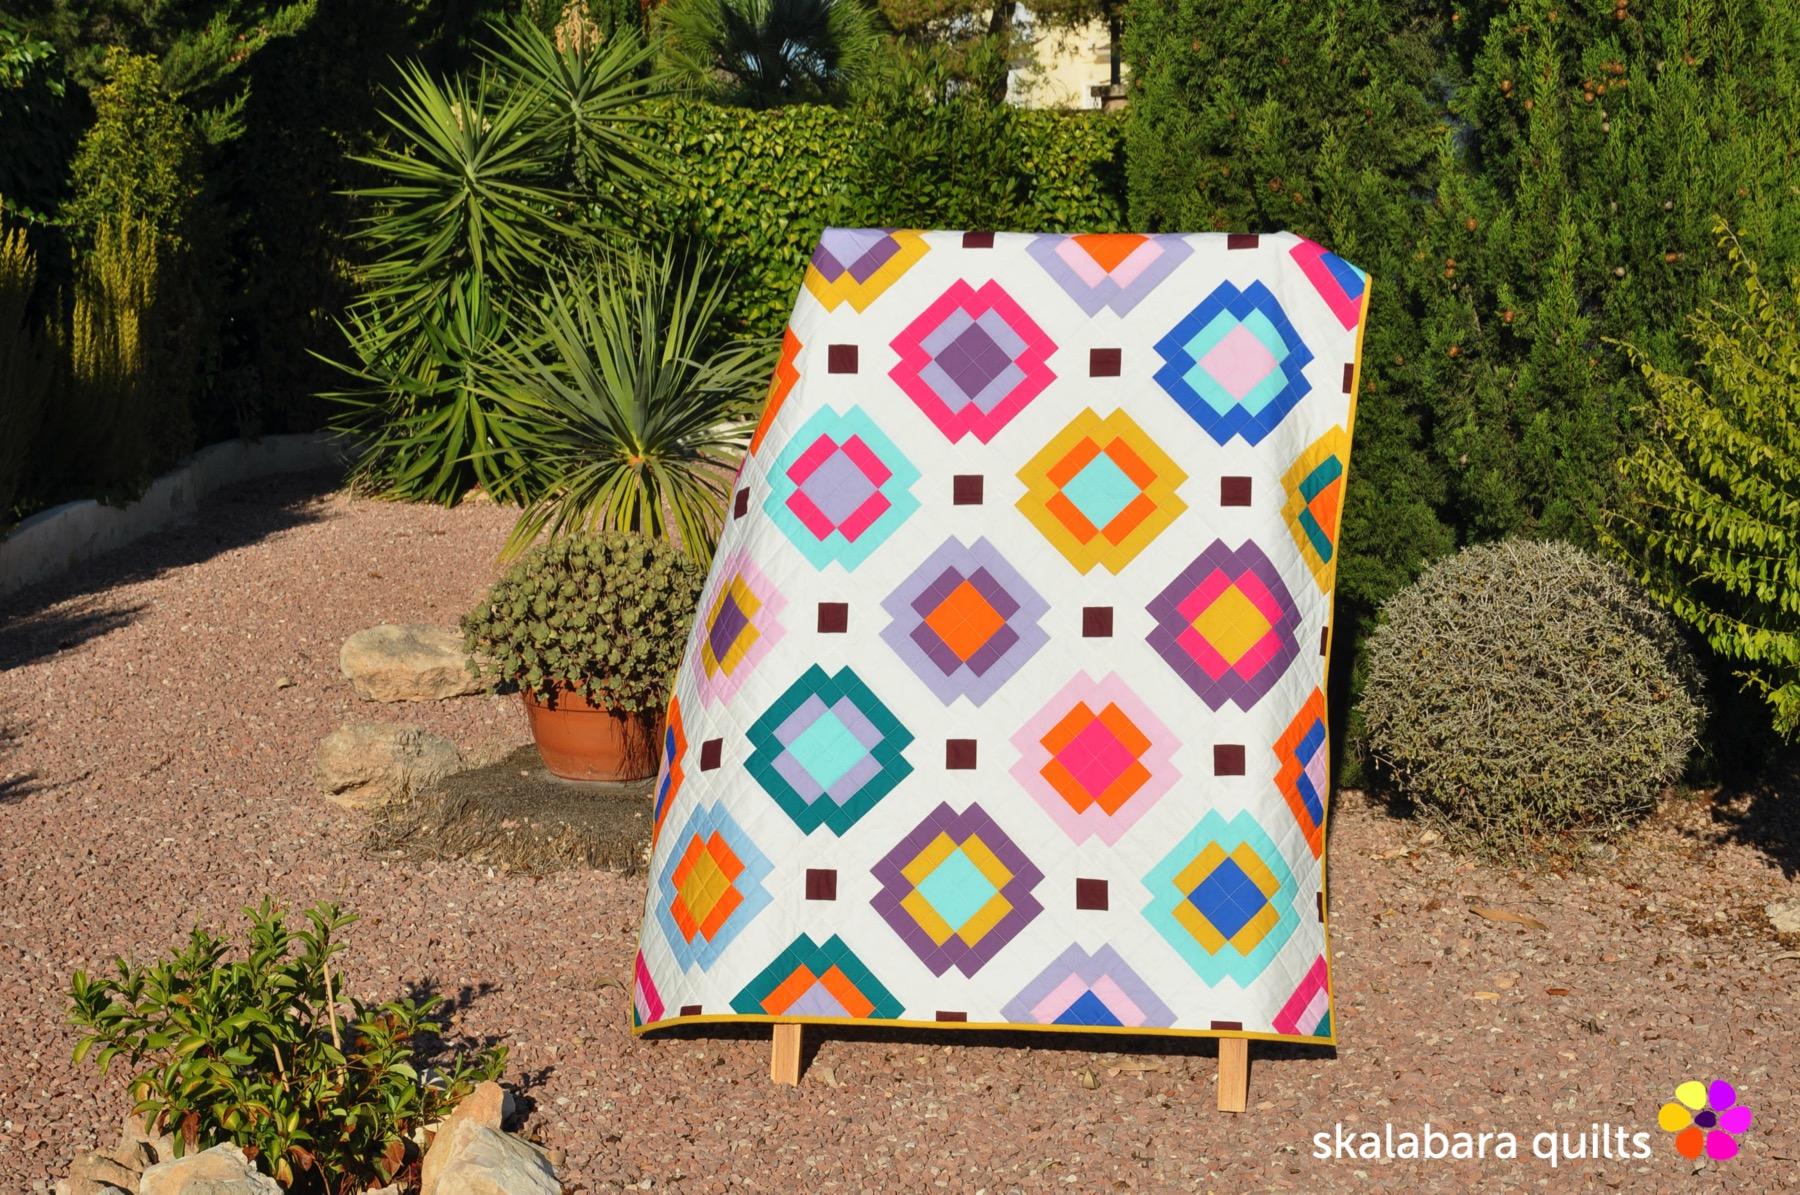 radiate quilt 1 - skalabara quilts